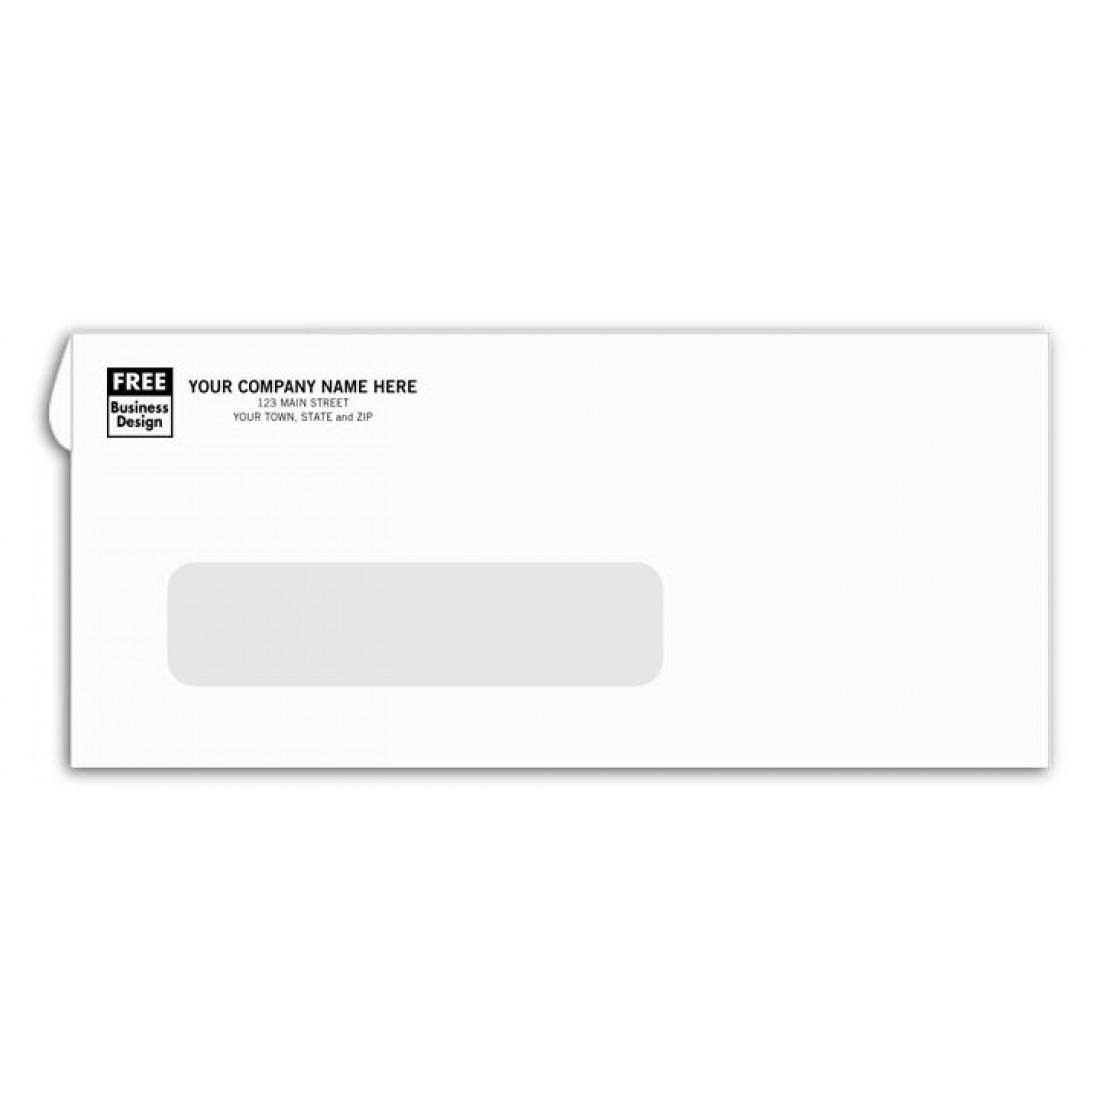 Confidential #9 Window Envelopes